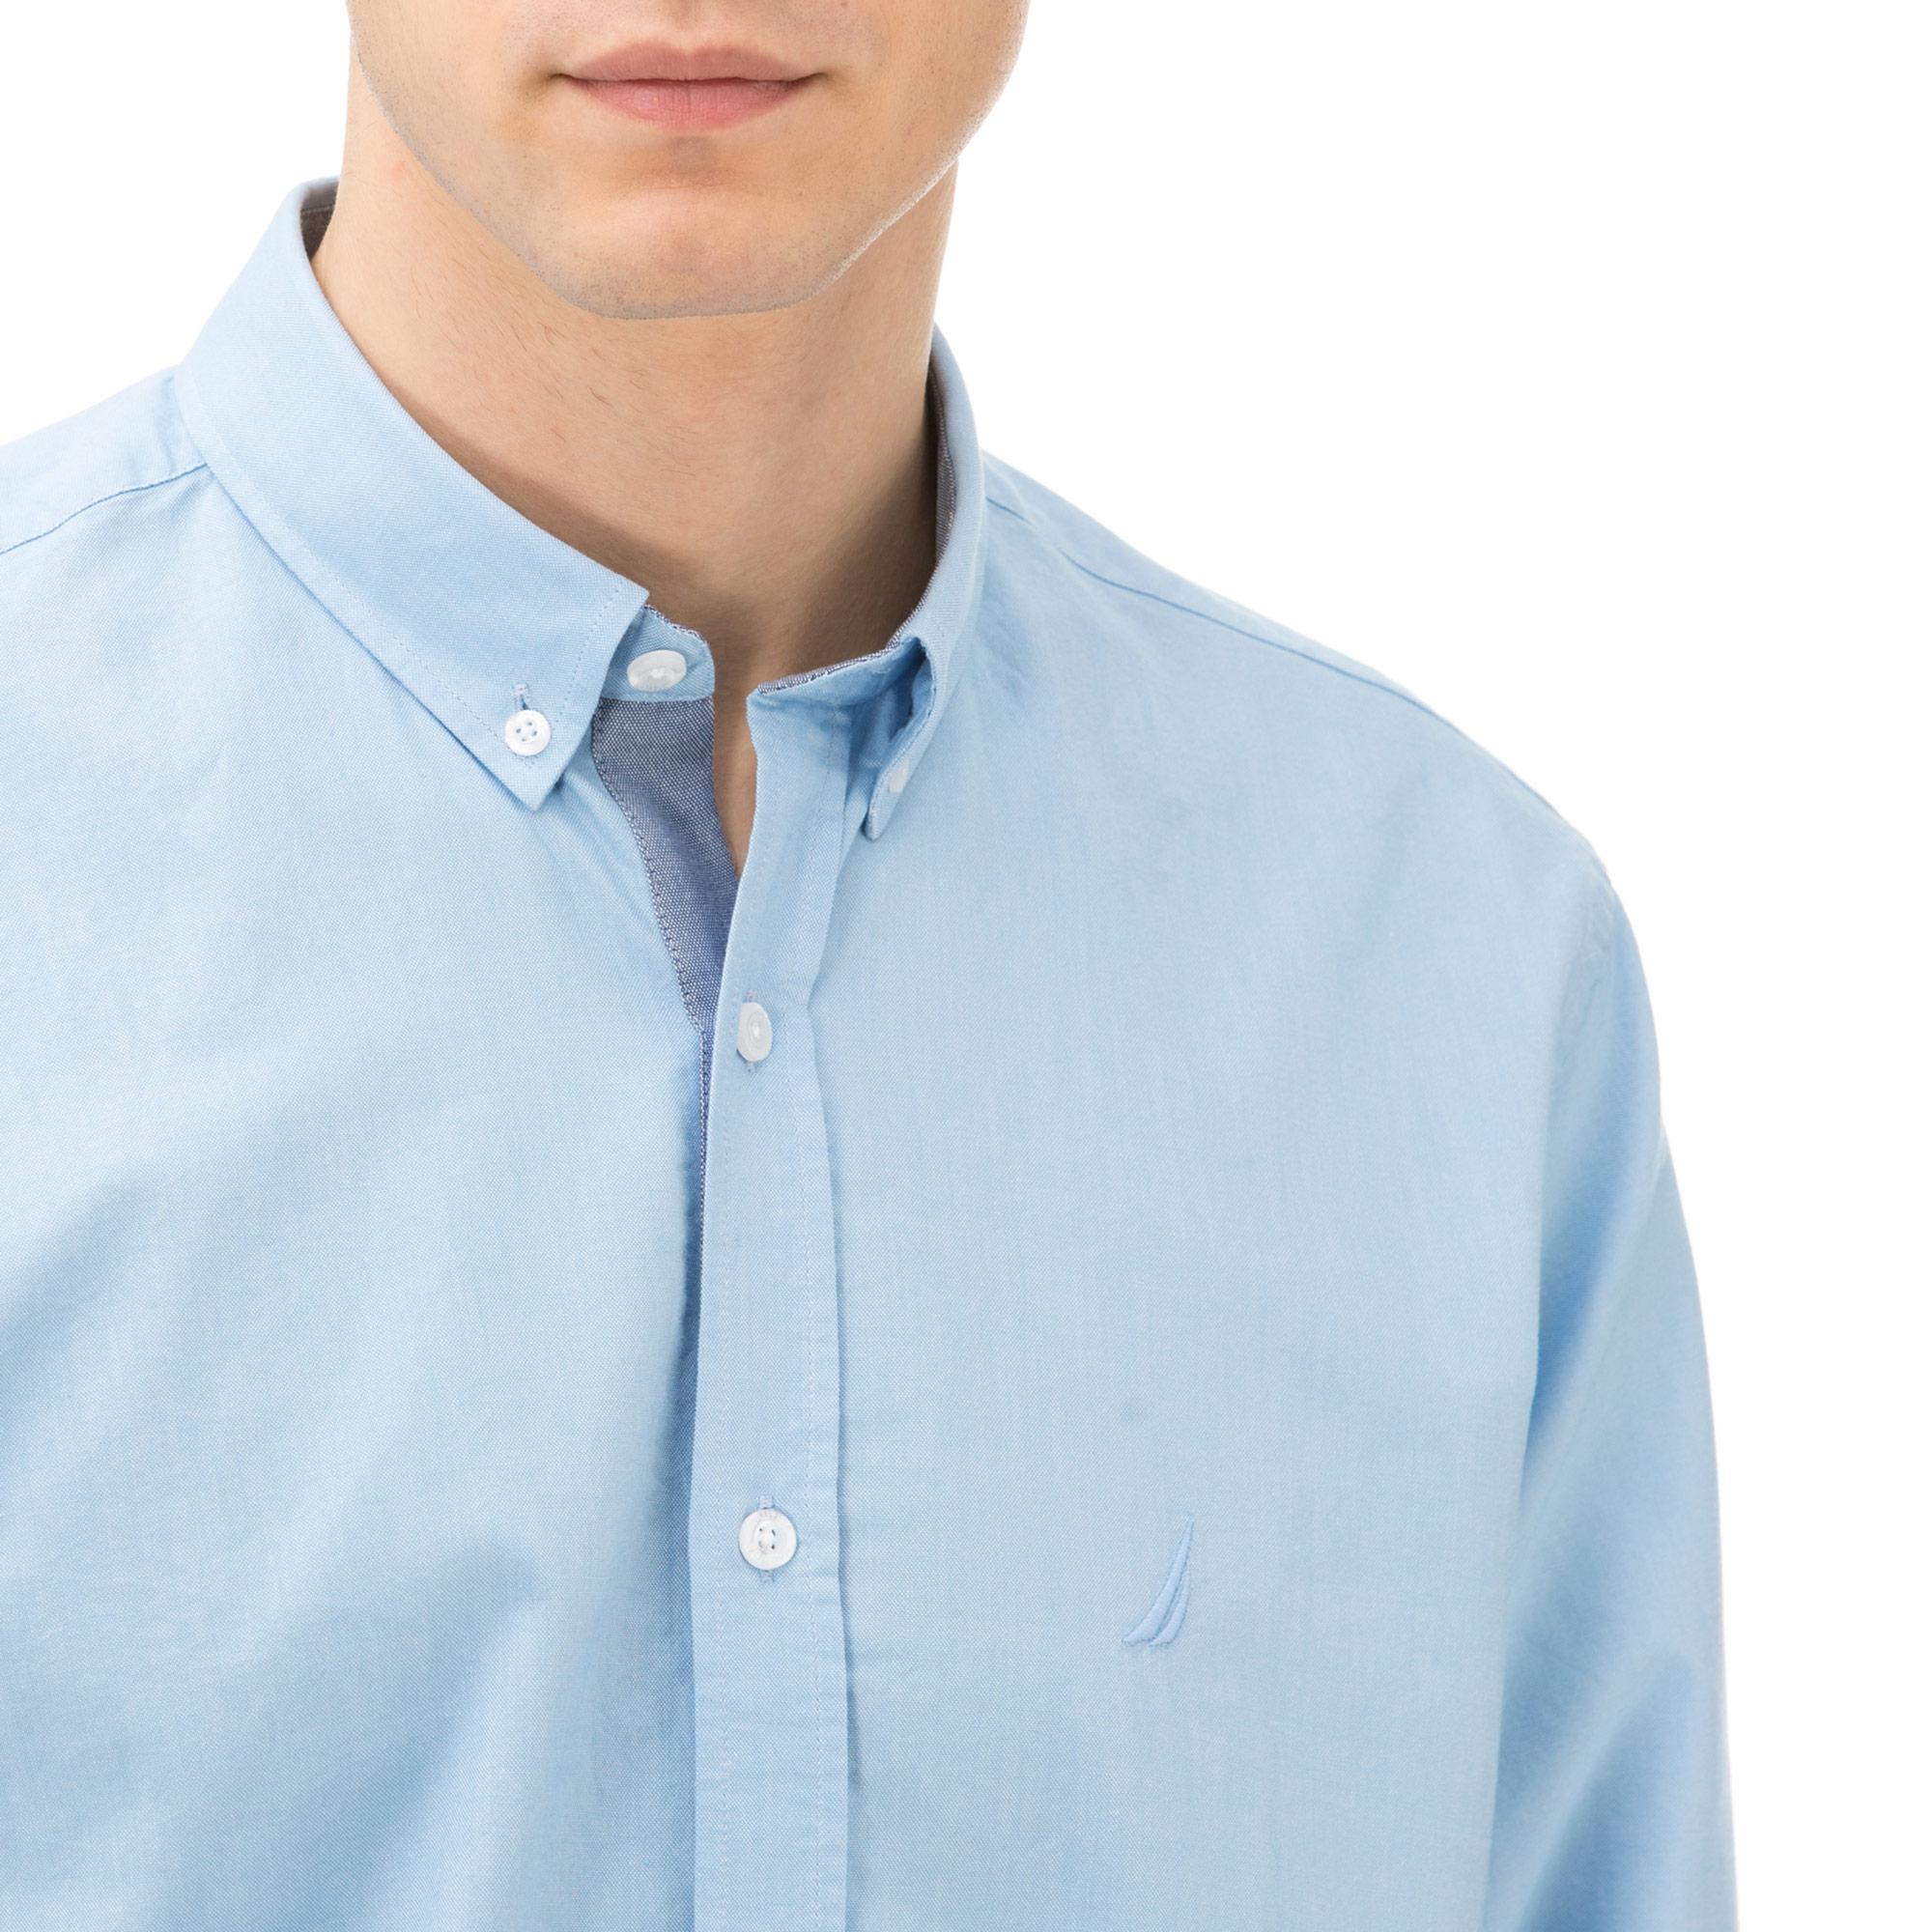 Nautica Erkek Classıc Fıt Açık Mavi Gömlek